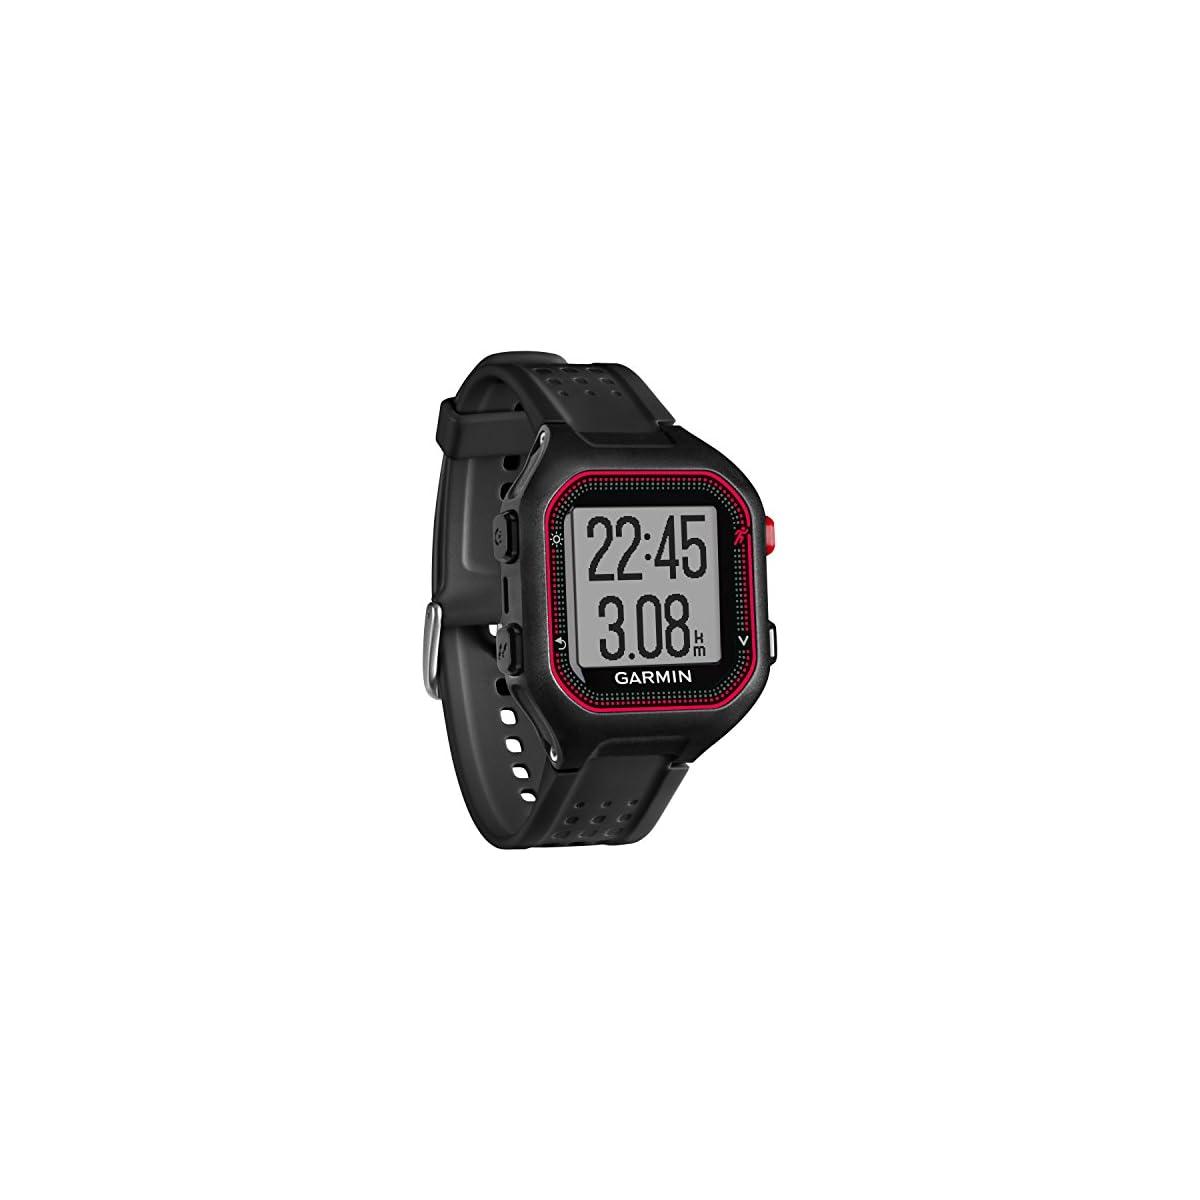 5130E2Gl HL. SS1200  - Garmin Forerunner 25 - Reloj Deportivo y Monitor de Actividad